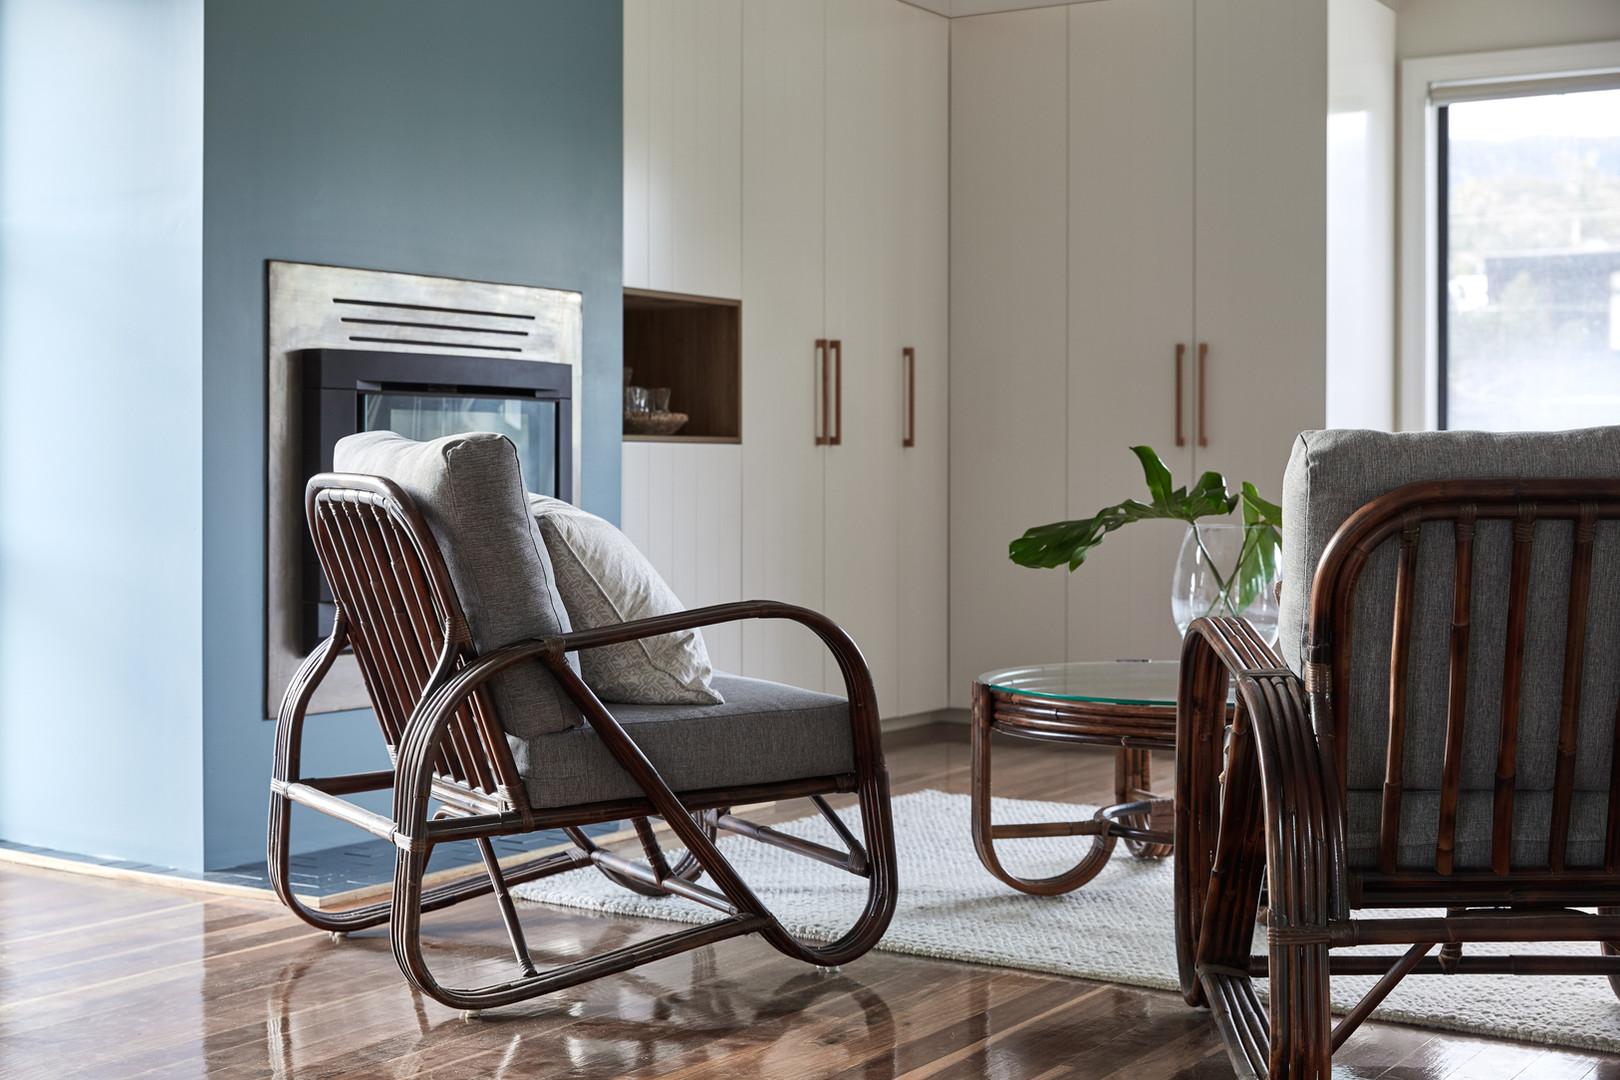 Corbett Avenue Thirroul, sitting room